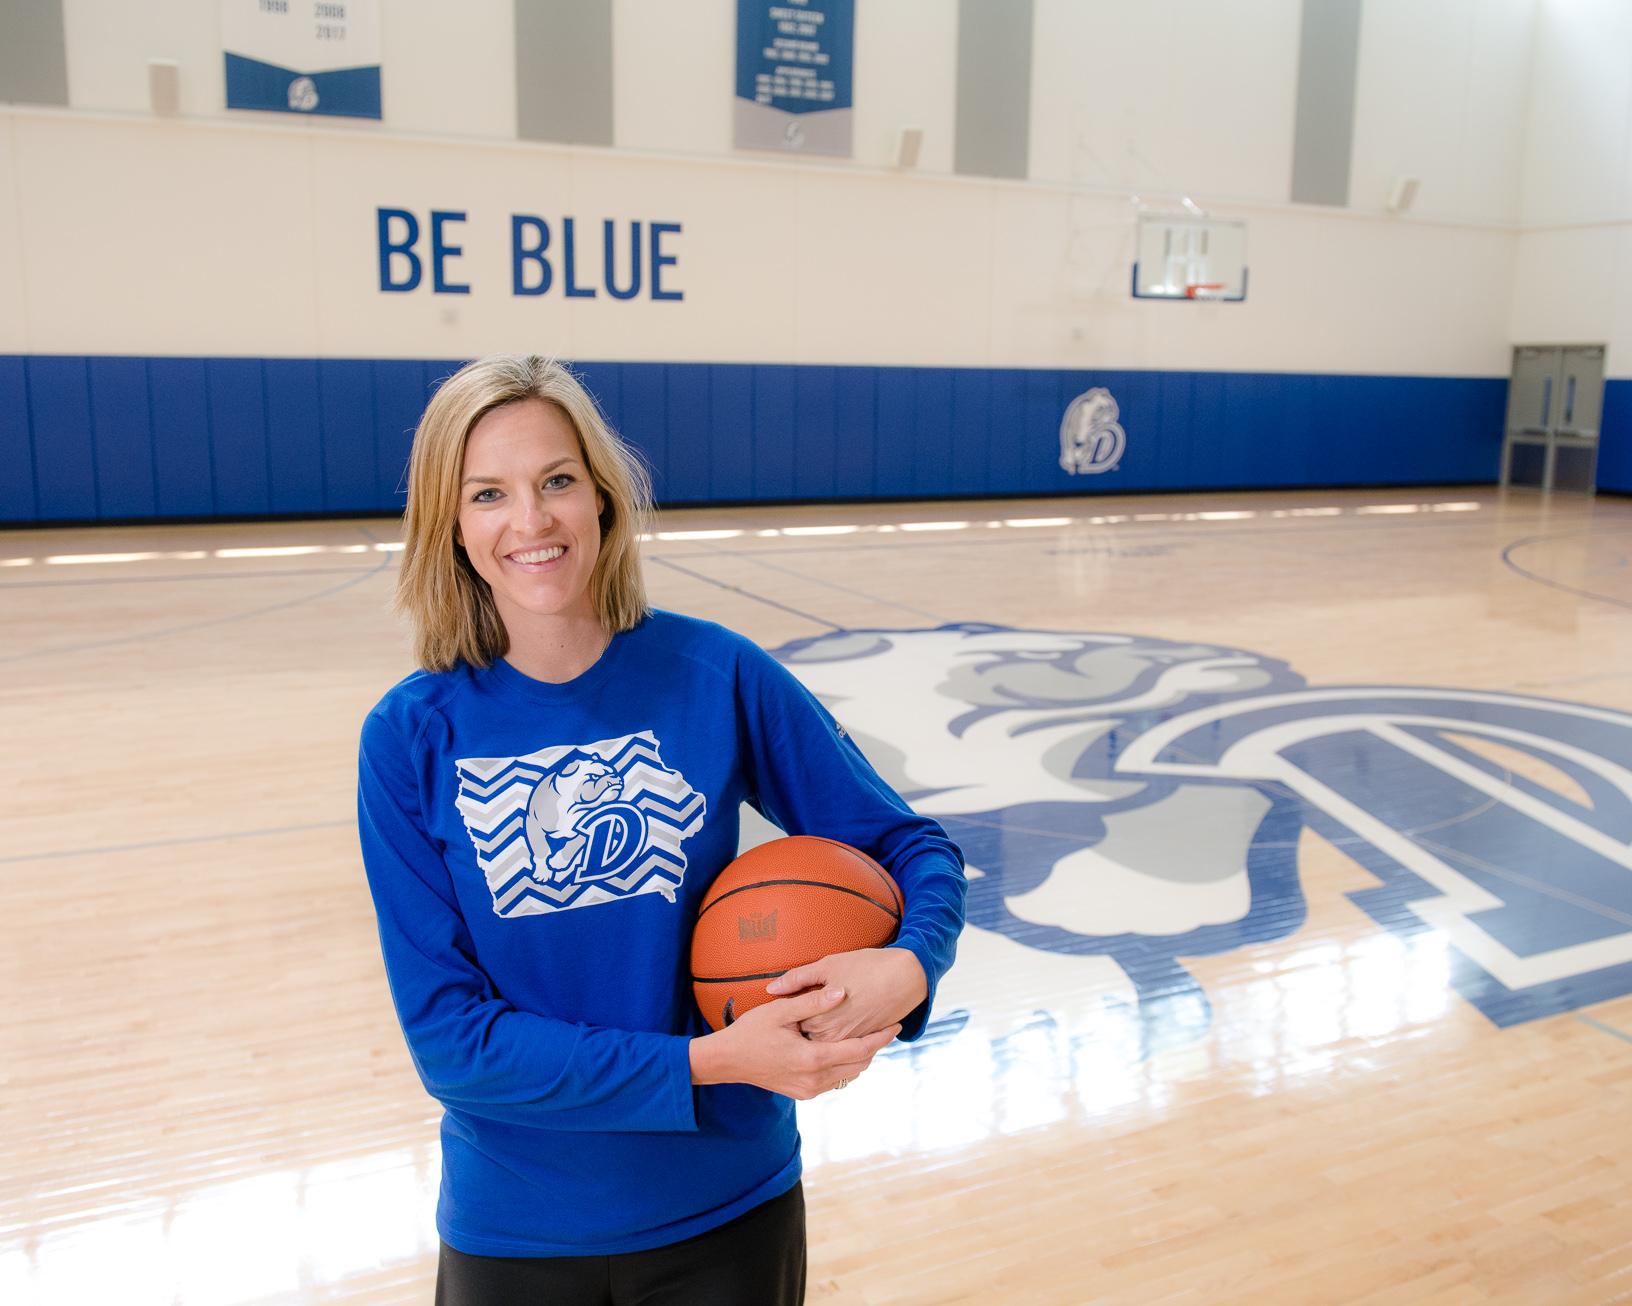 Jennie Baranczyk is the head coach of Drake University Women's Basketball. Photo credit: Joseph L. Murphy/Iowa Soybean Association